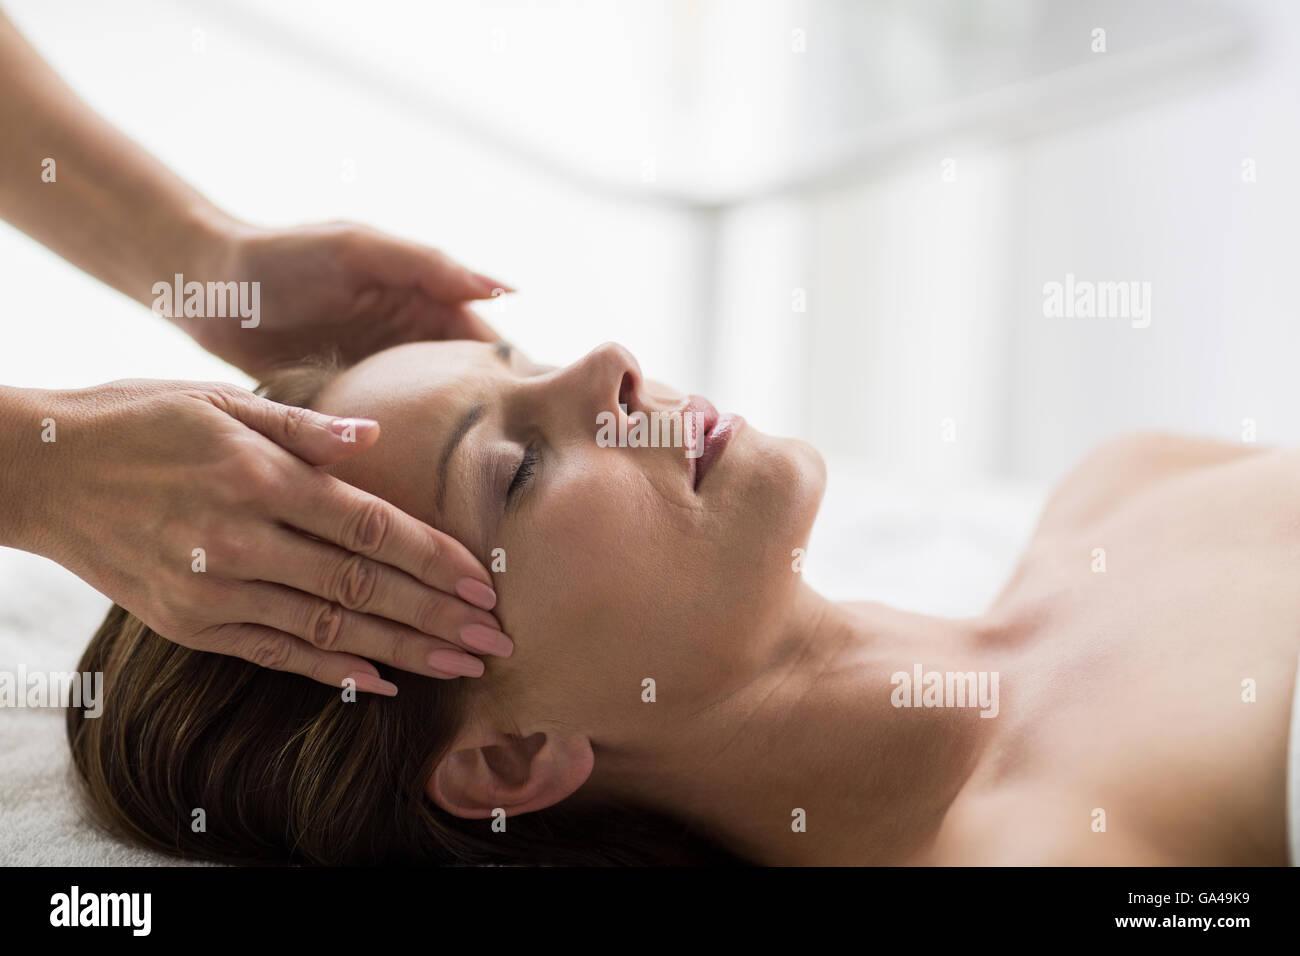 Massuer treating customer in spa - Stock Image